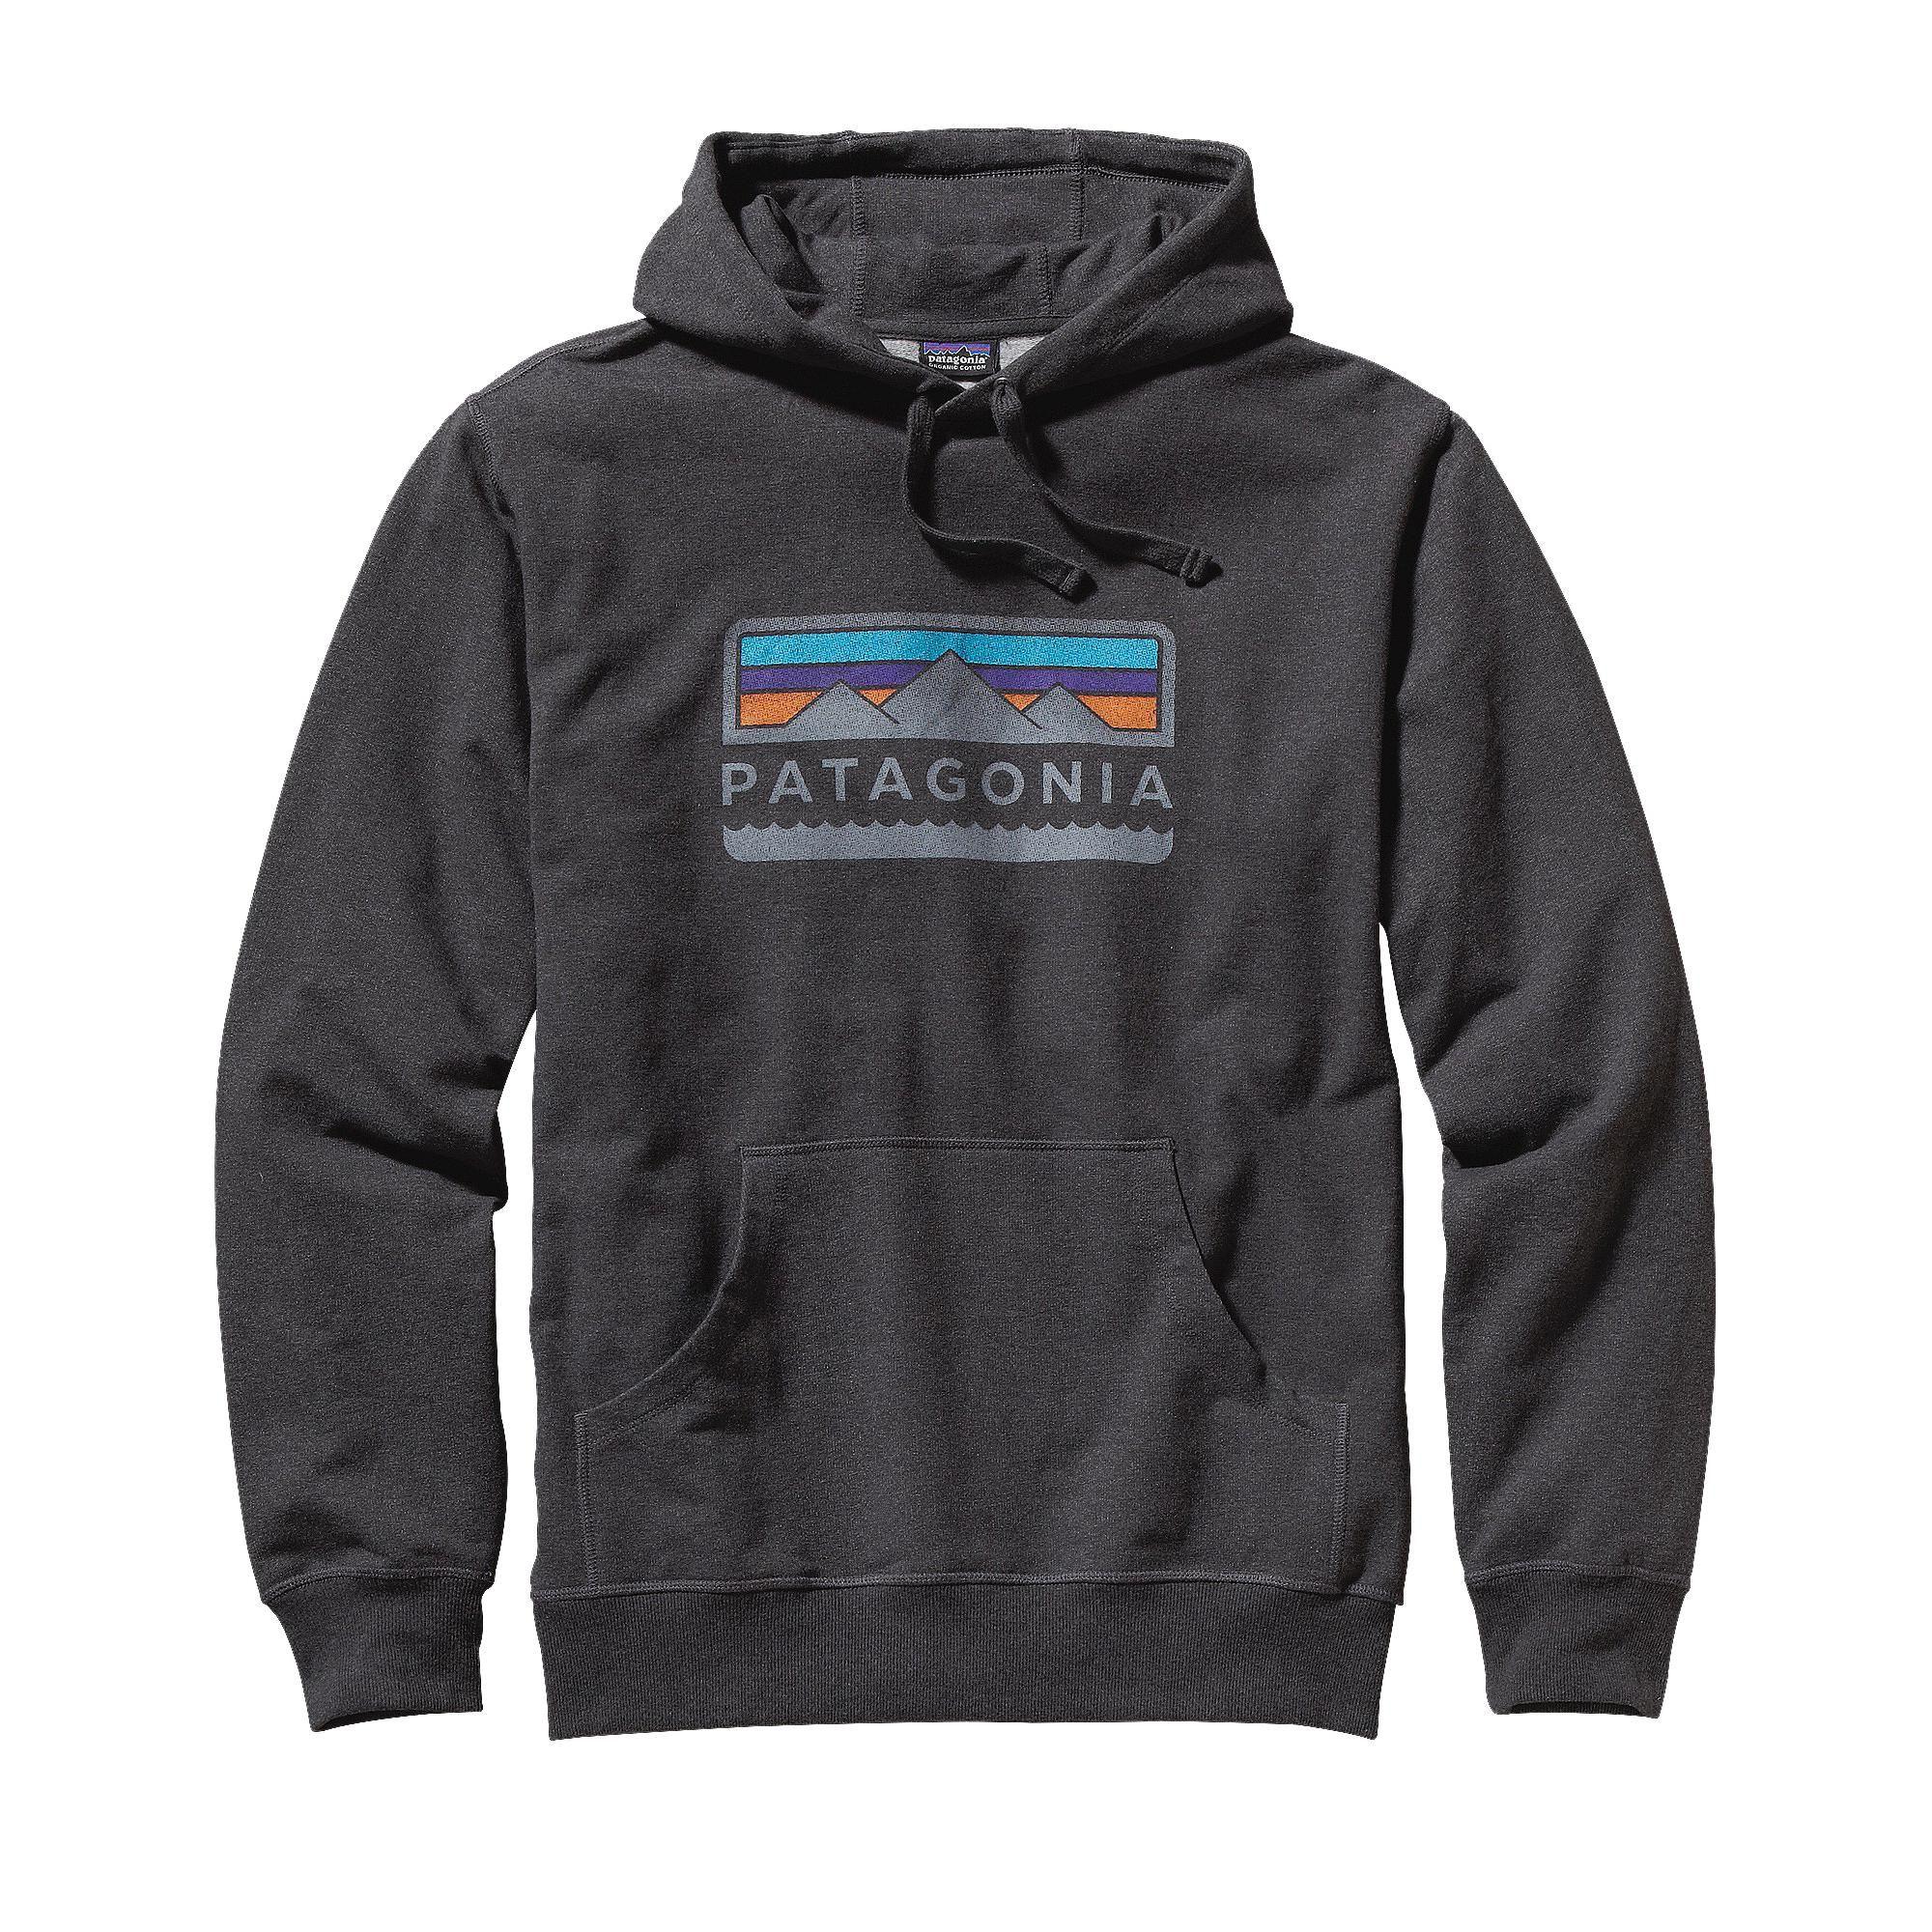 Patagonia Men S Tres Peaks Midweight Pullover Hoody Hoodies Men Pullover Hoodies Men Outdoor Outfit [ 2000 x 2000 Pixel ]